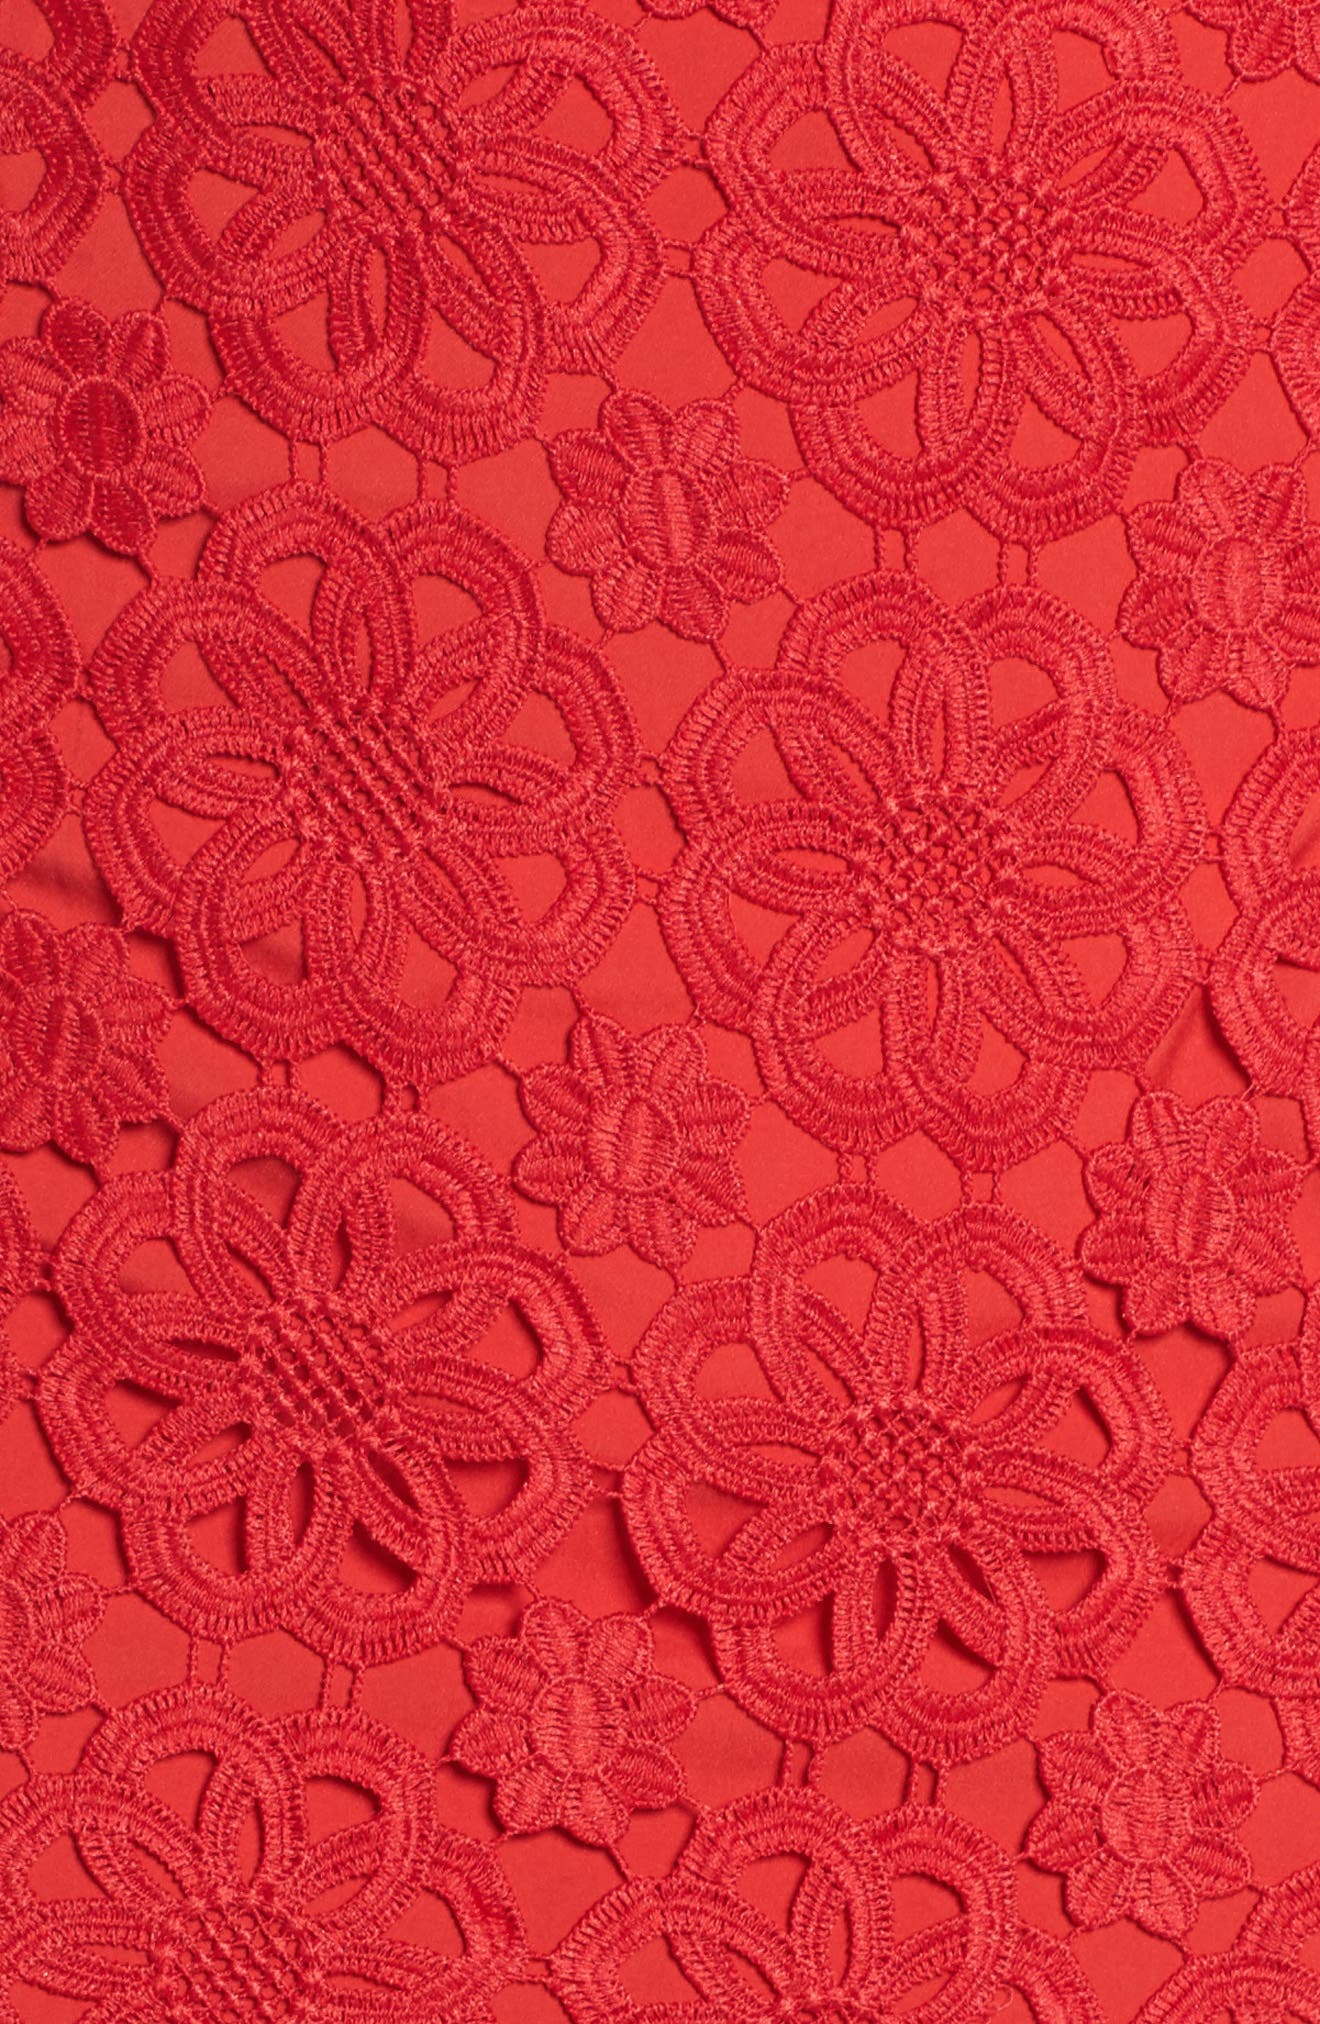 Ruffle Hem Lace Sheath Dress,                             Alternate thumbnail 6, color,                             Red